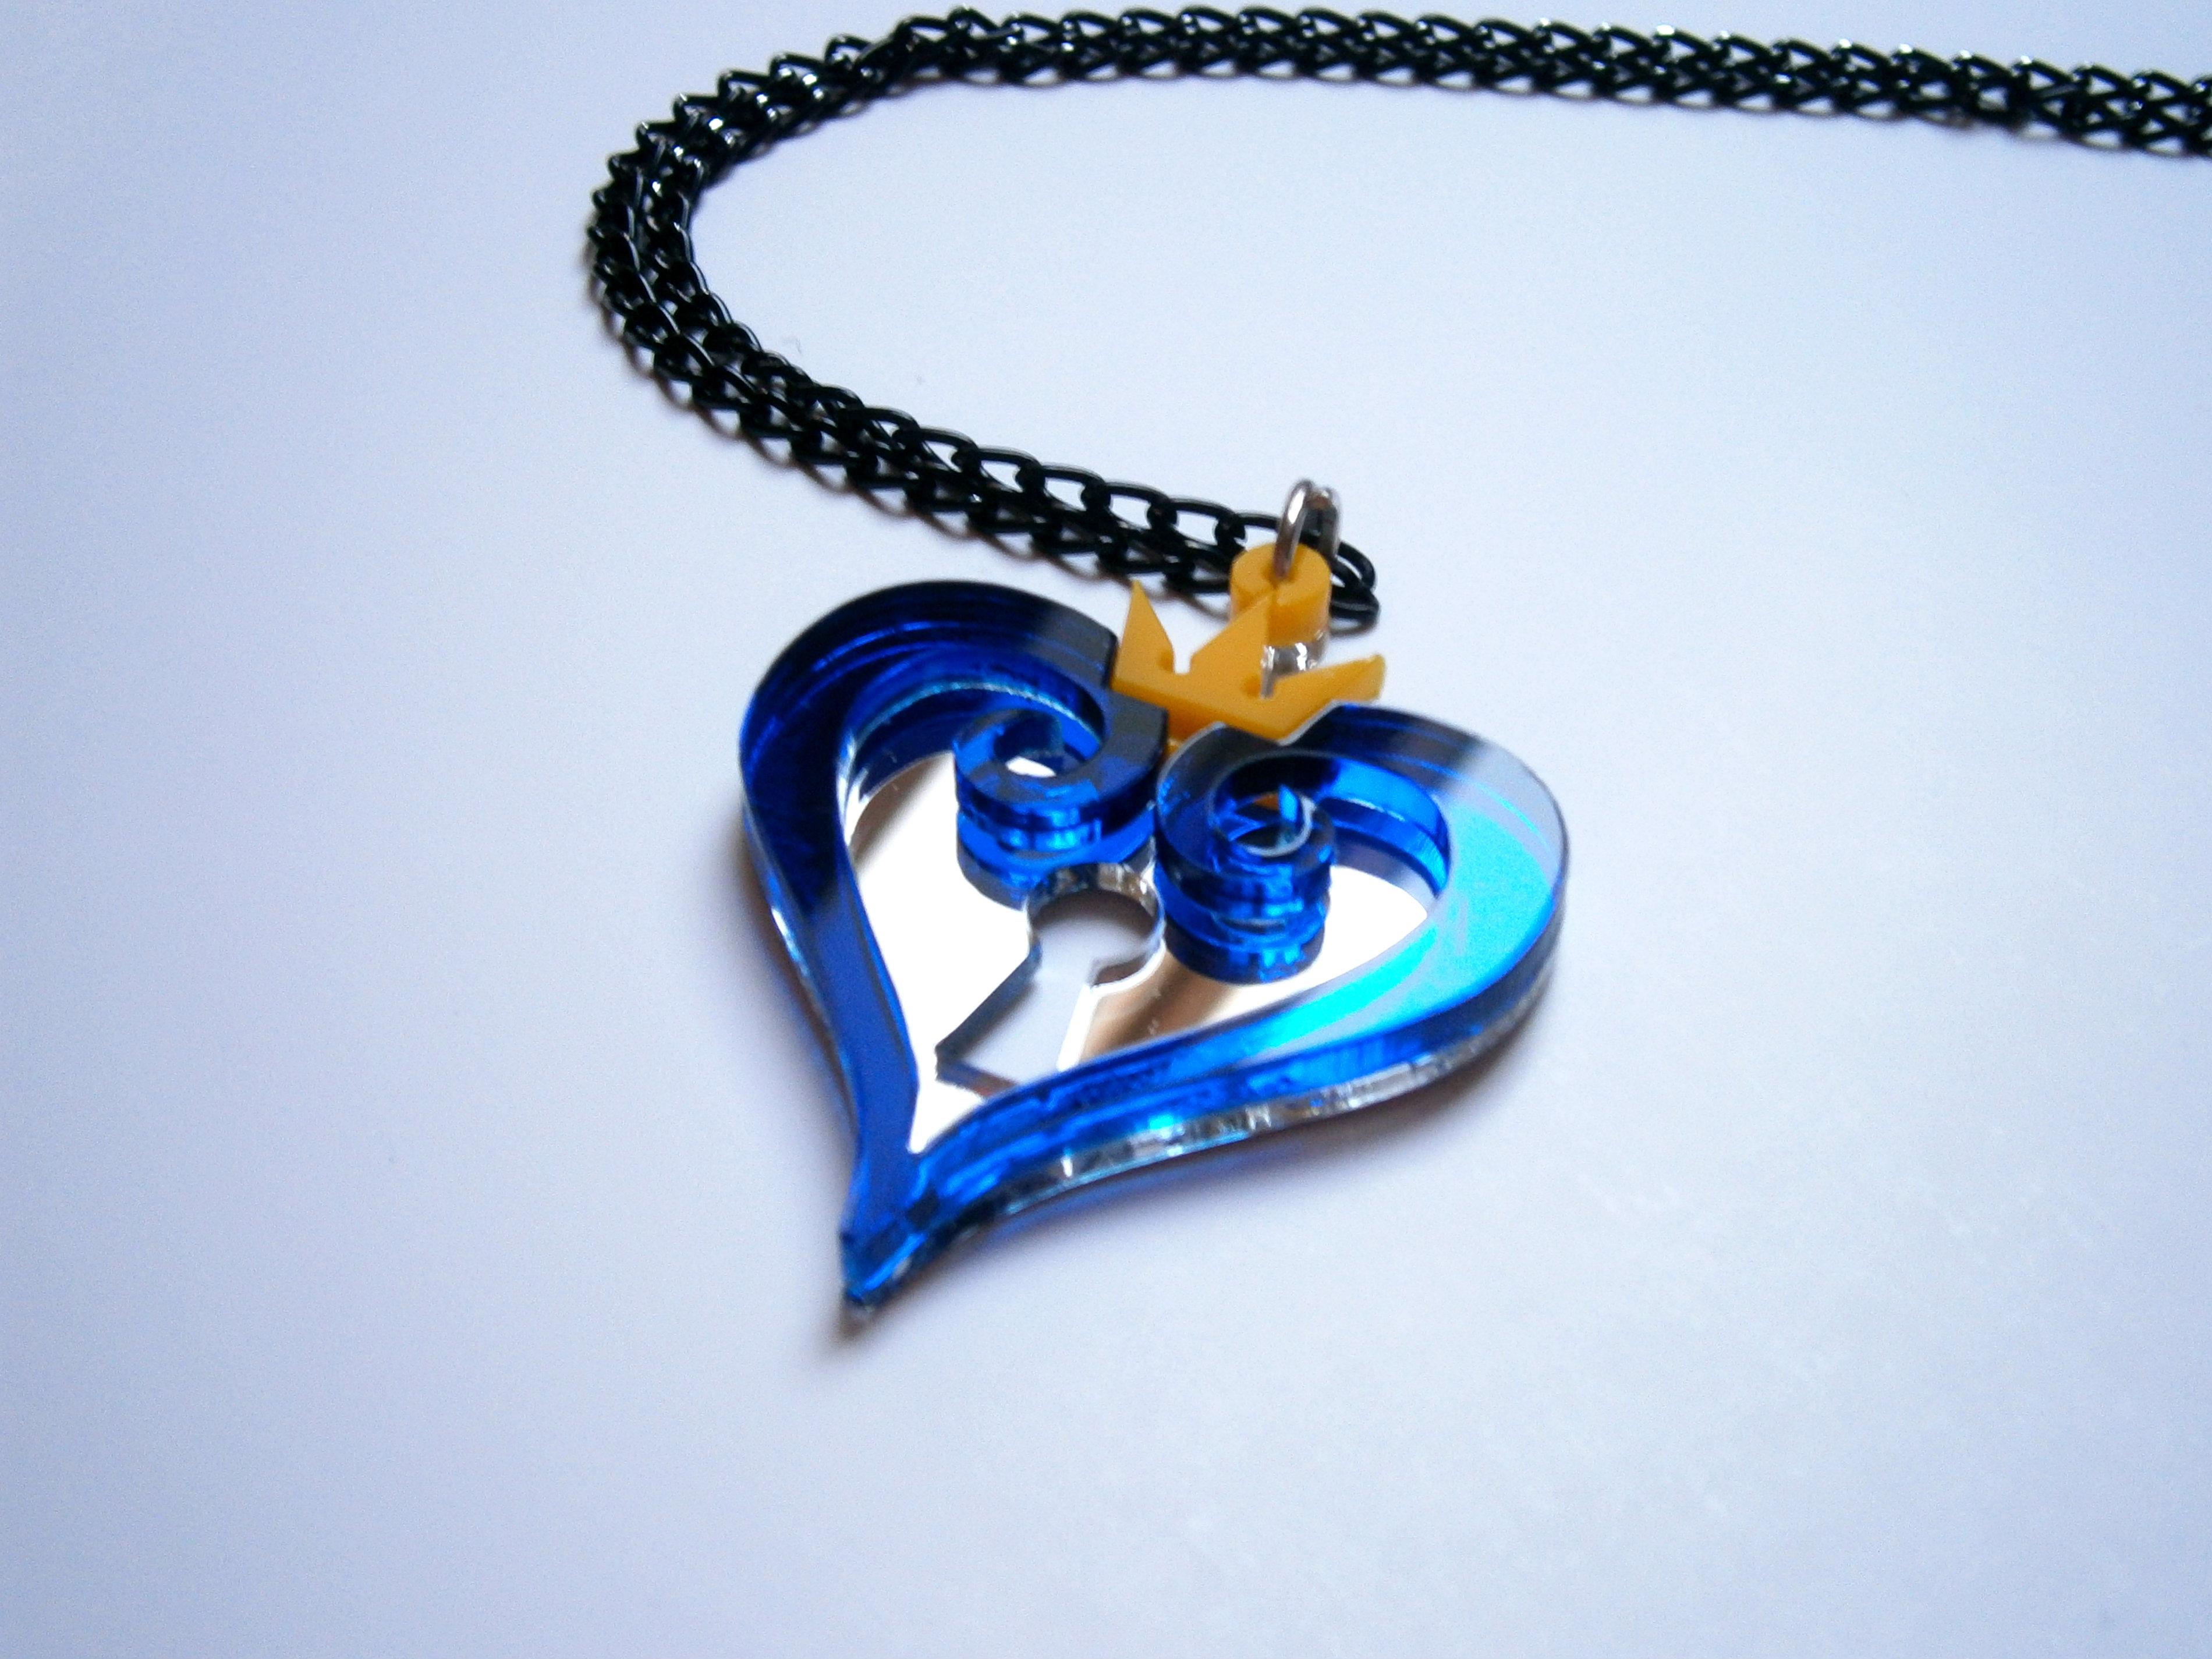 Kingdom hearts nobody emblem pendant necklace laser cut jewelry mozeypictures Images